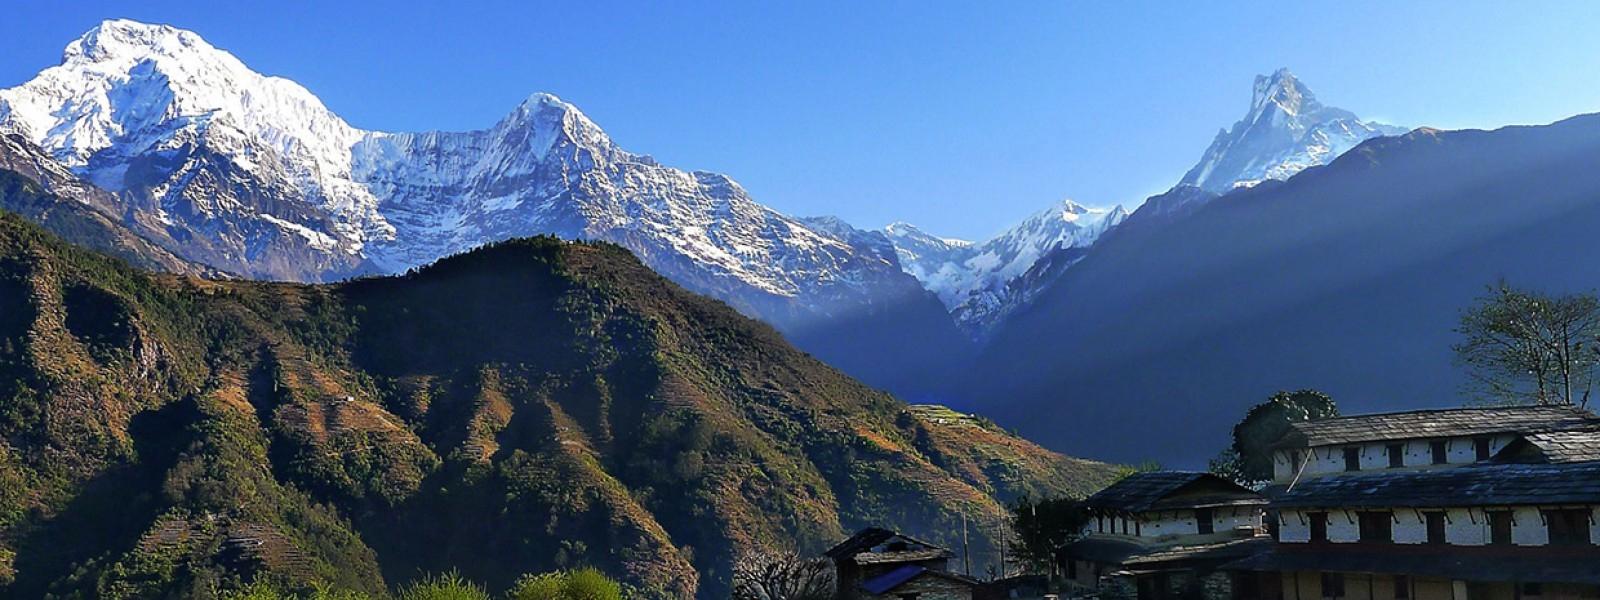 Annapurna range view from Ghandruk Village